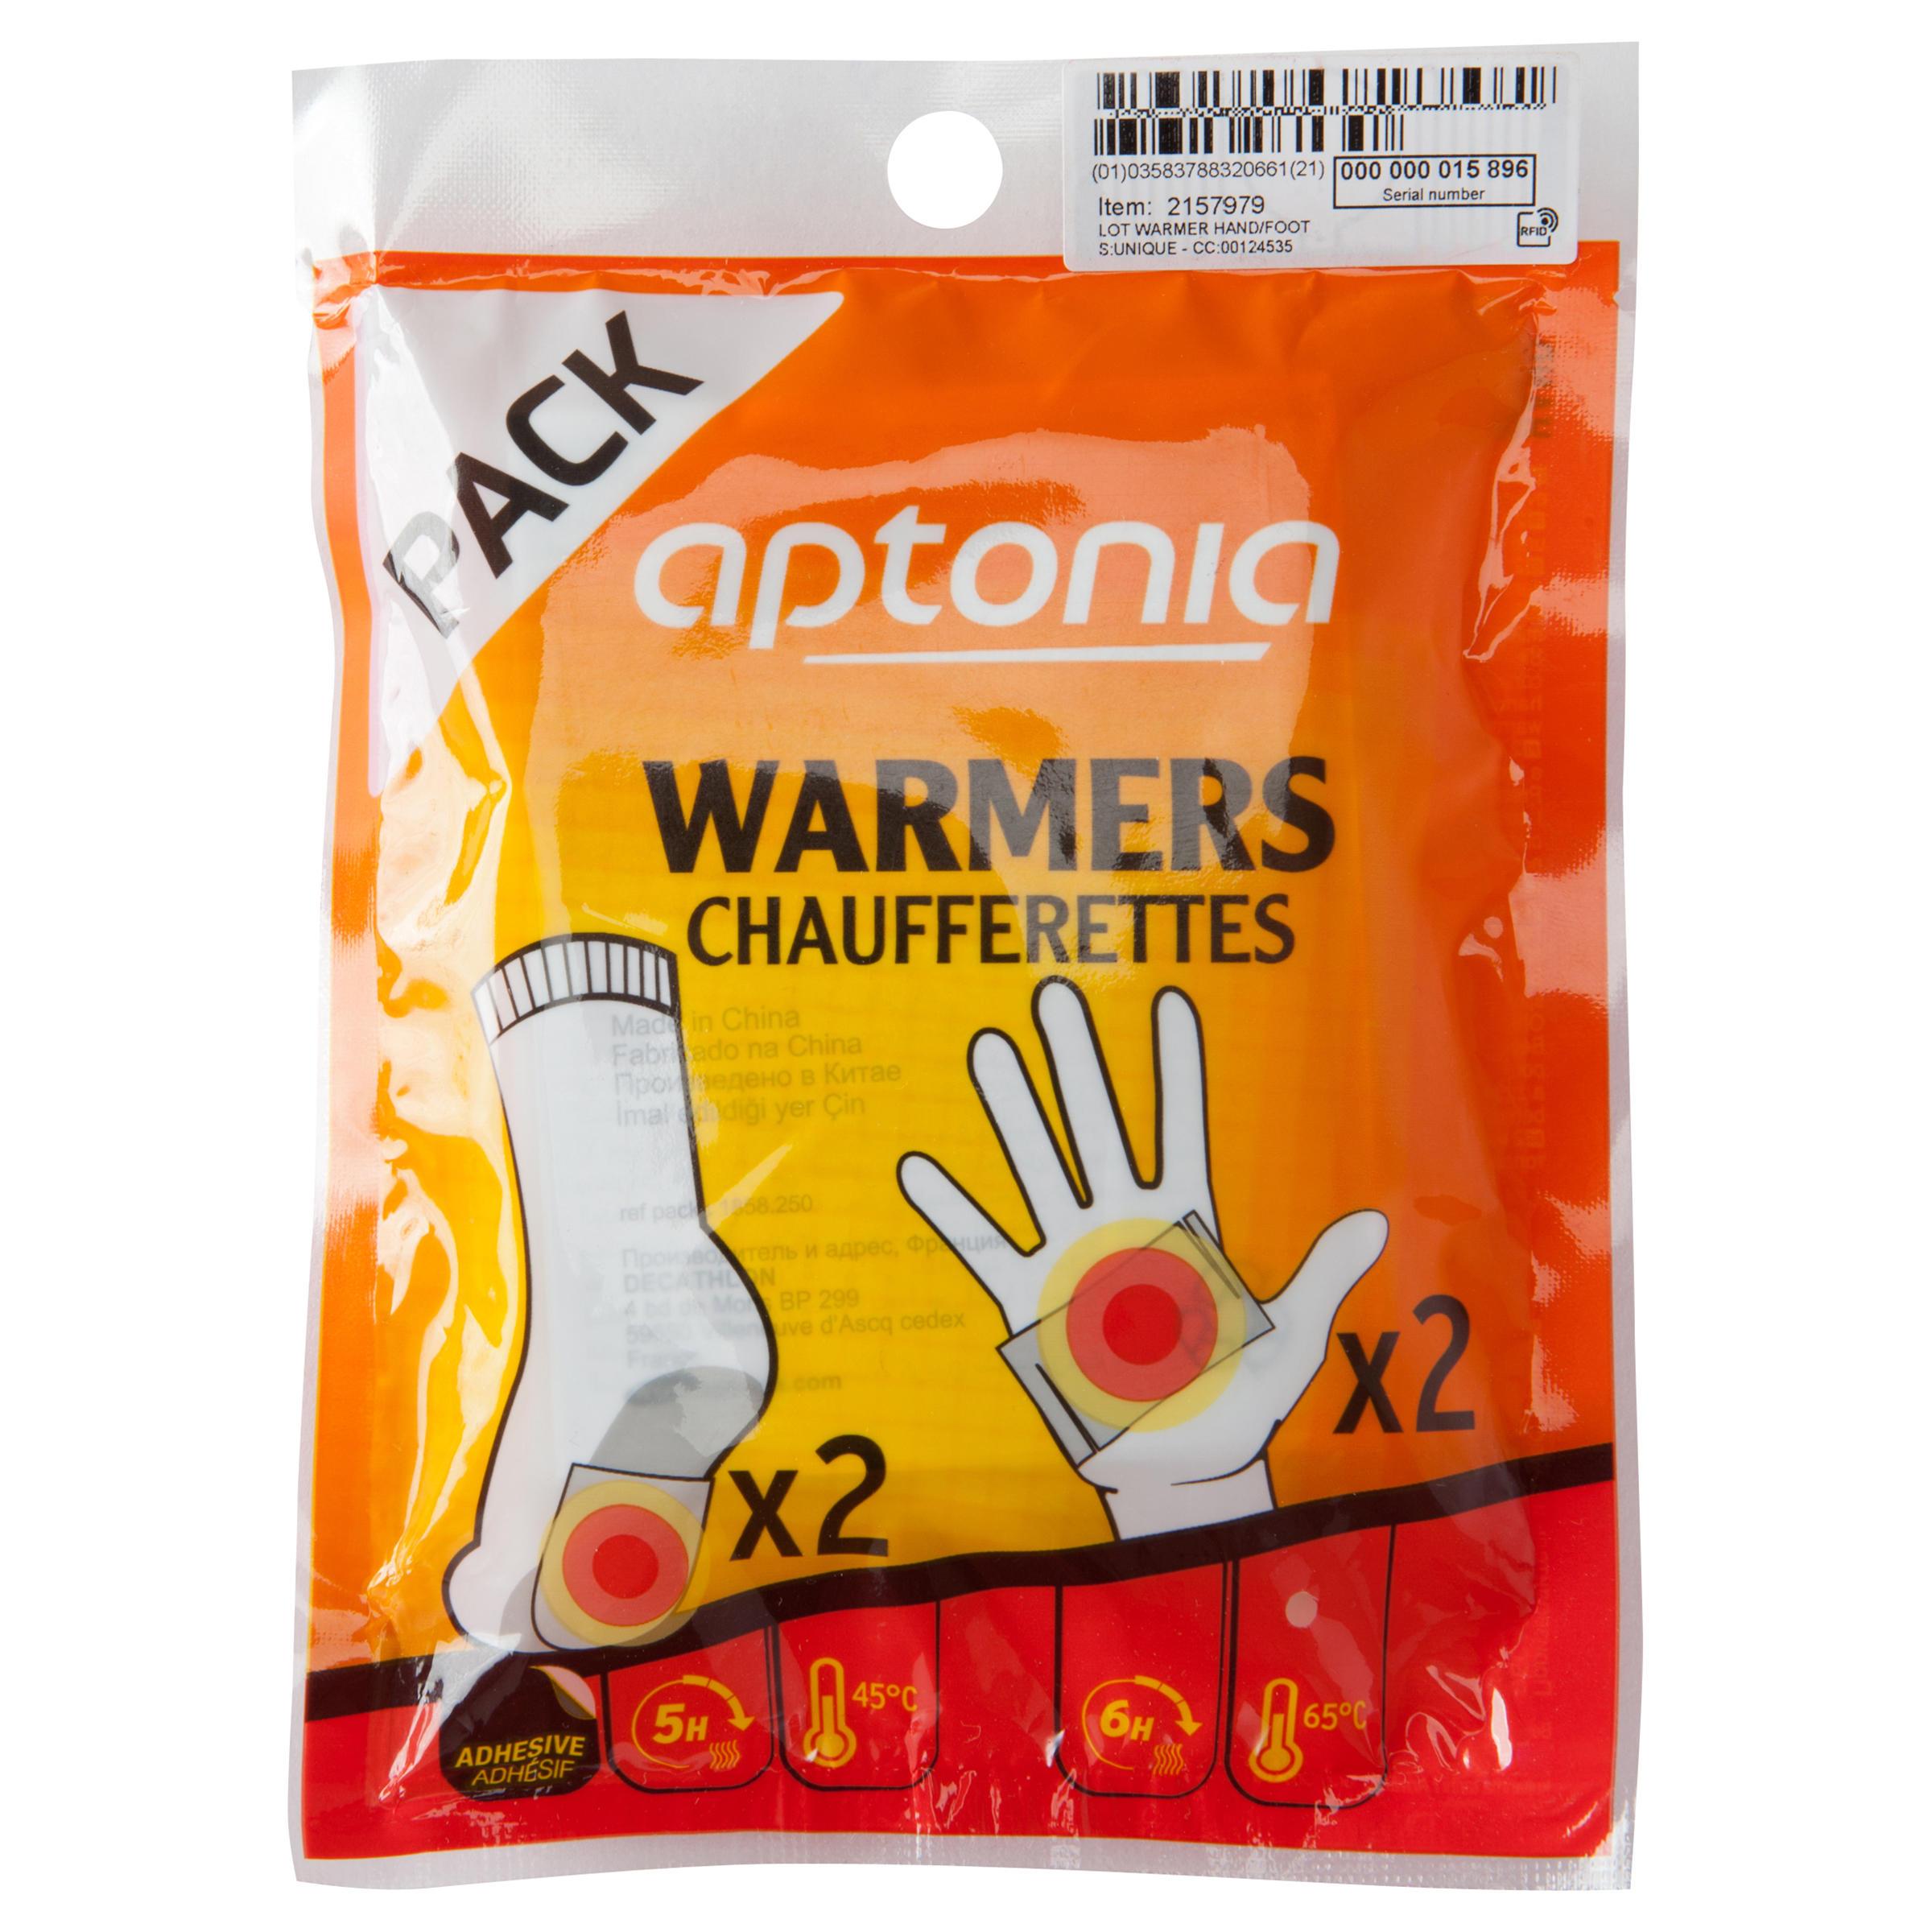 Aptonia Kennismakingspakje hand- en voetwarmers 2 x 2 stuks thumbnail